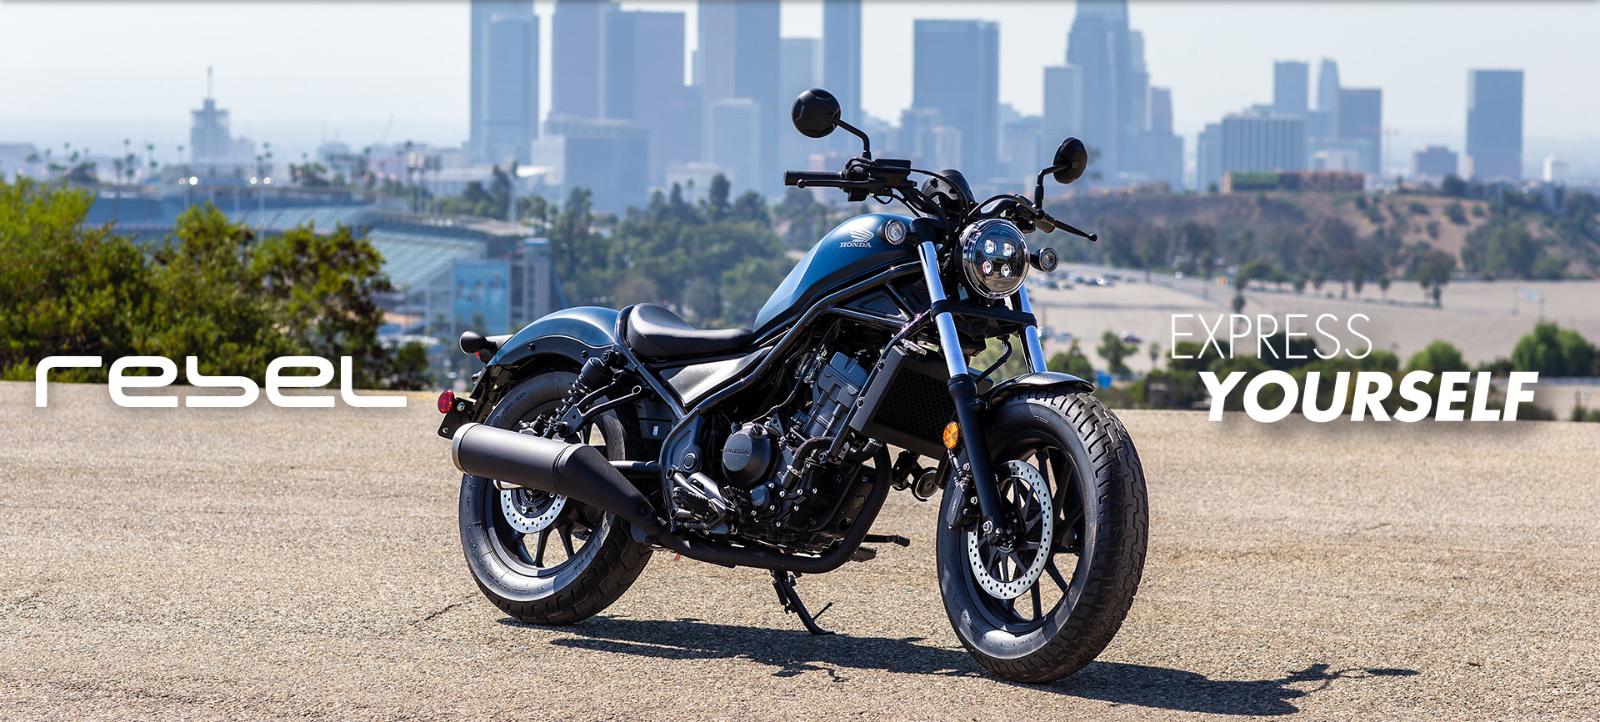 Honda Reble 500 2020